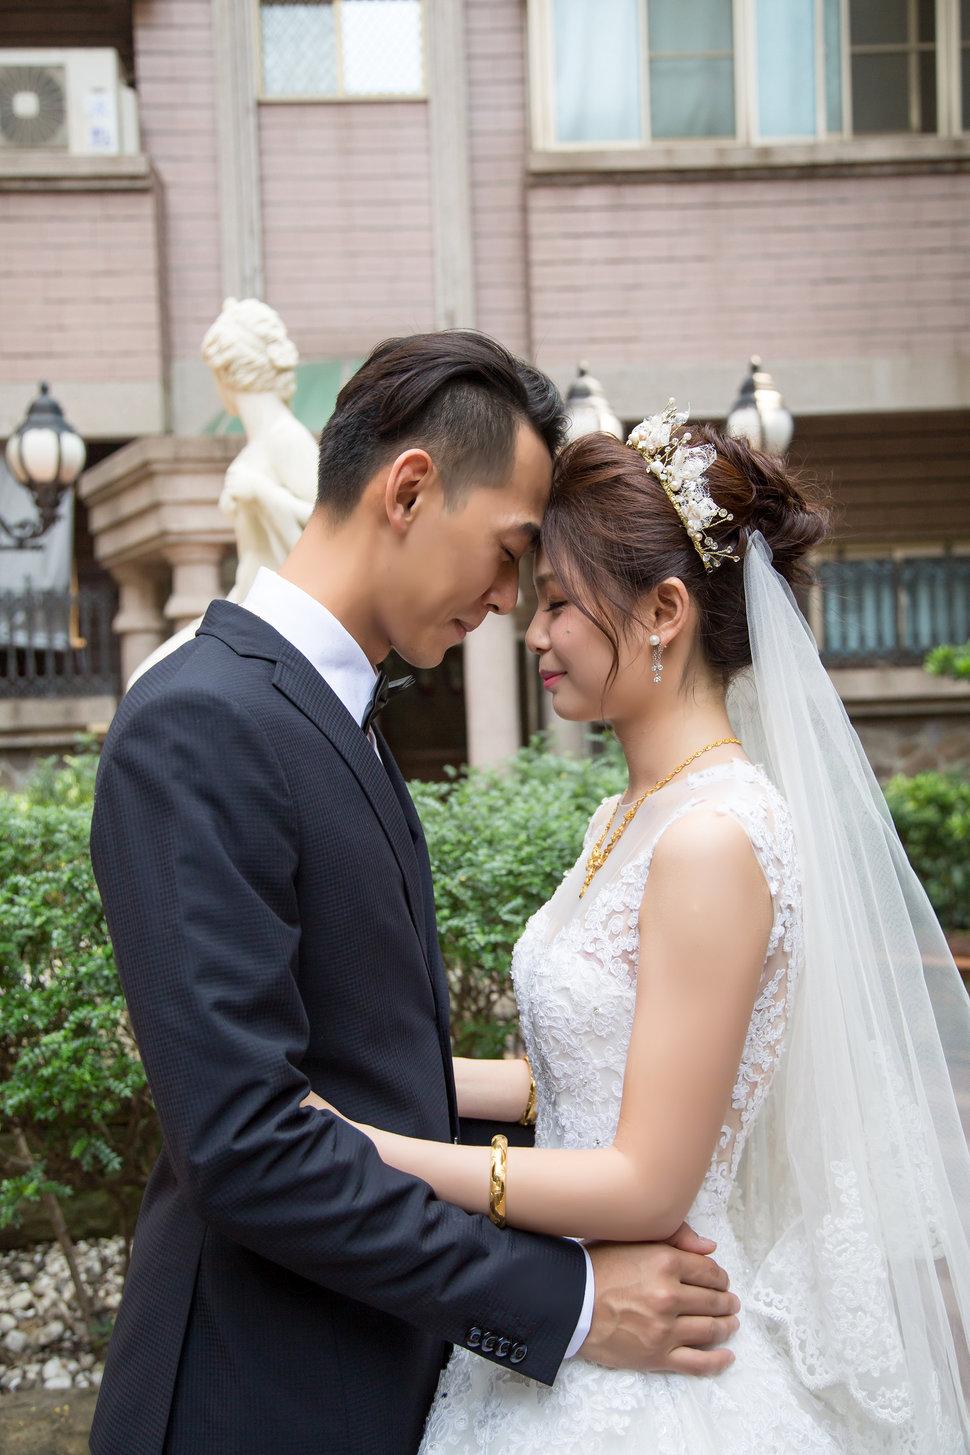 Jason &  Mavis   婚禮紀錄(編號:459122) - AT影像 - 結婚吧